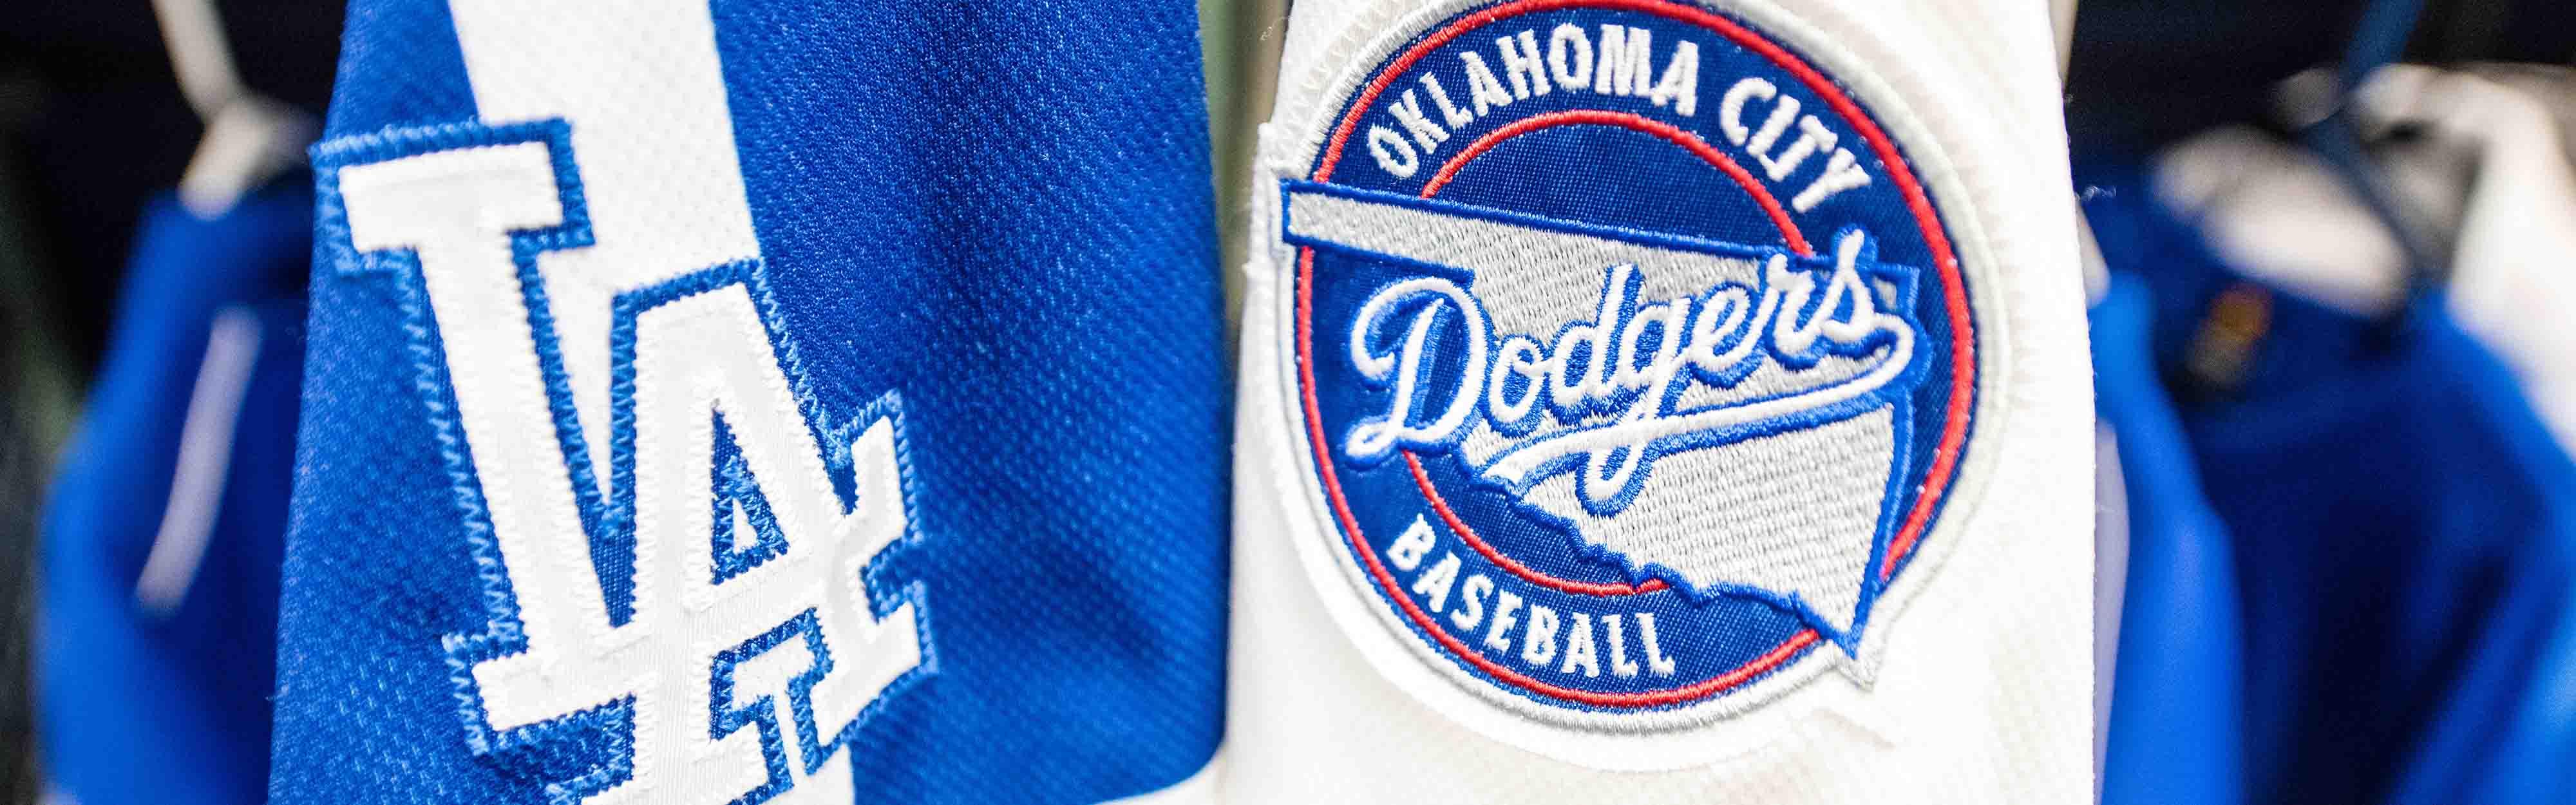 Oklahoma City Dodgers 16:5